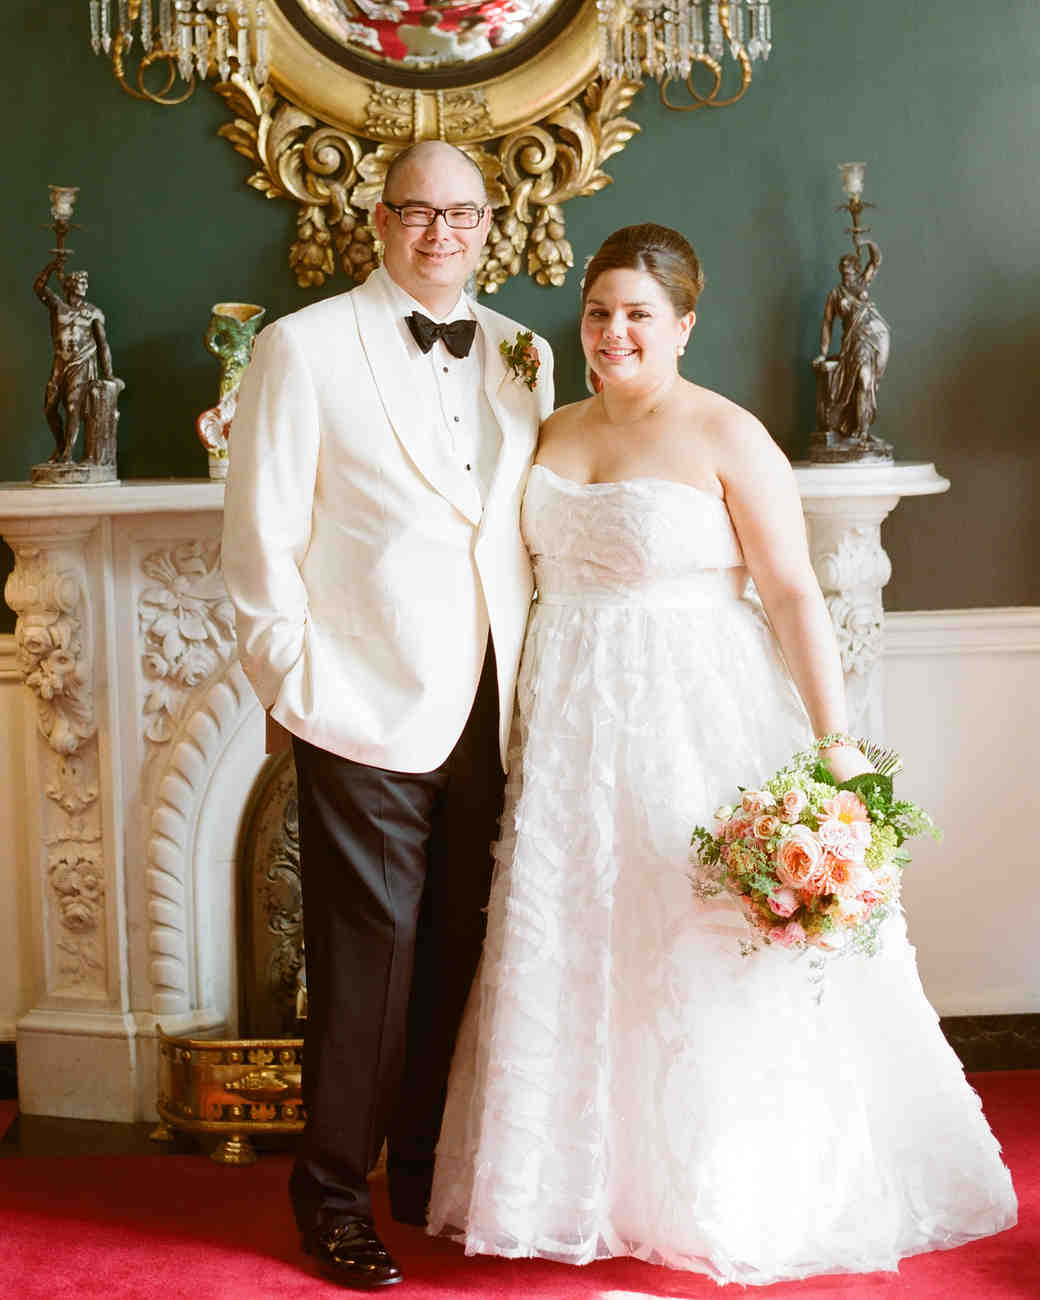 An Elegant Retro-Vintage Destination Wedding in West Virginia